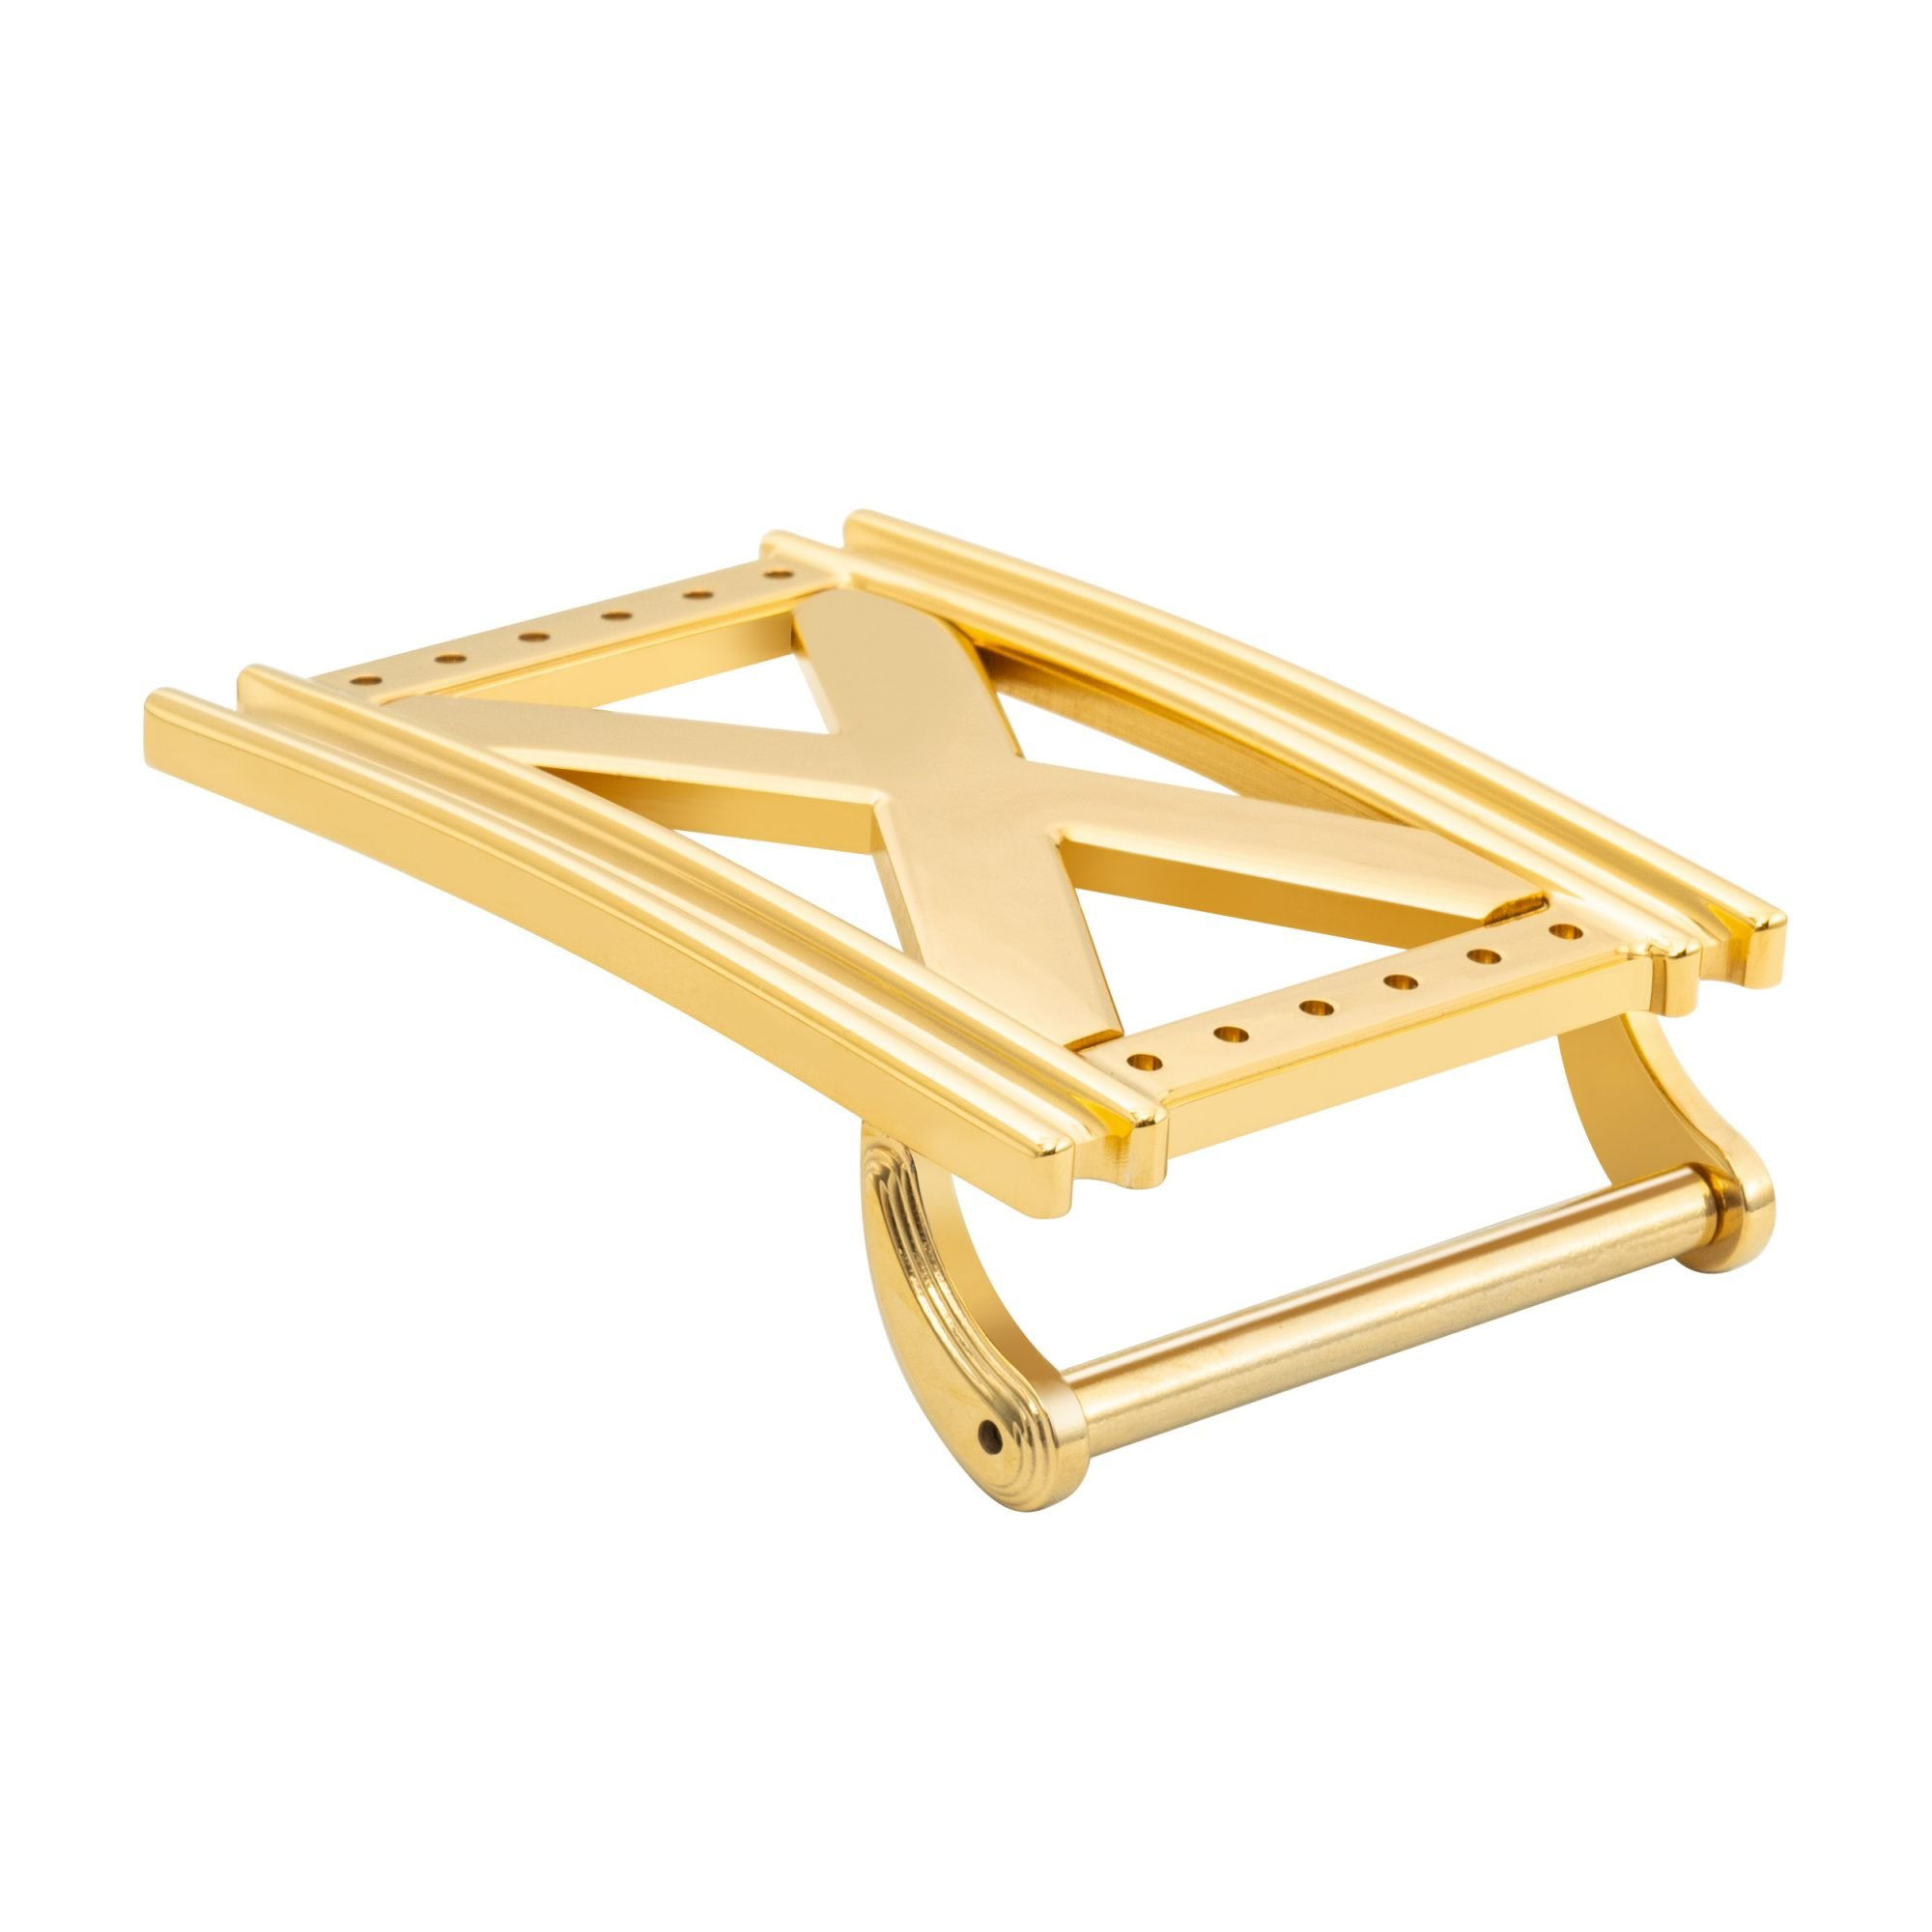 VIKTOR ALEXANDER 38MM STAINLESS STEEL BELT BUCKLE REPERTOIRE X YELLOW GOLD SIDE PROFILE